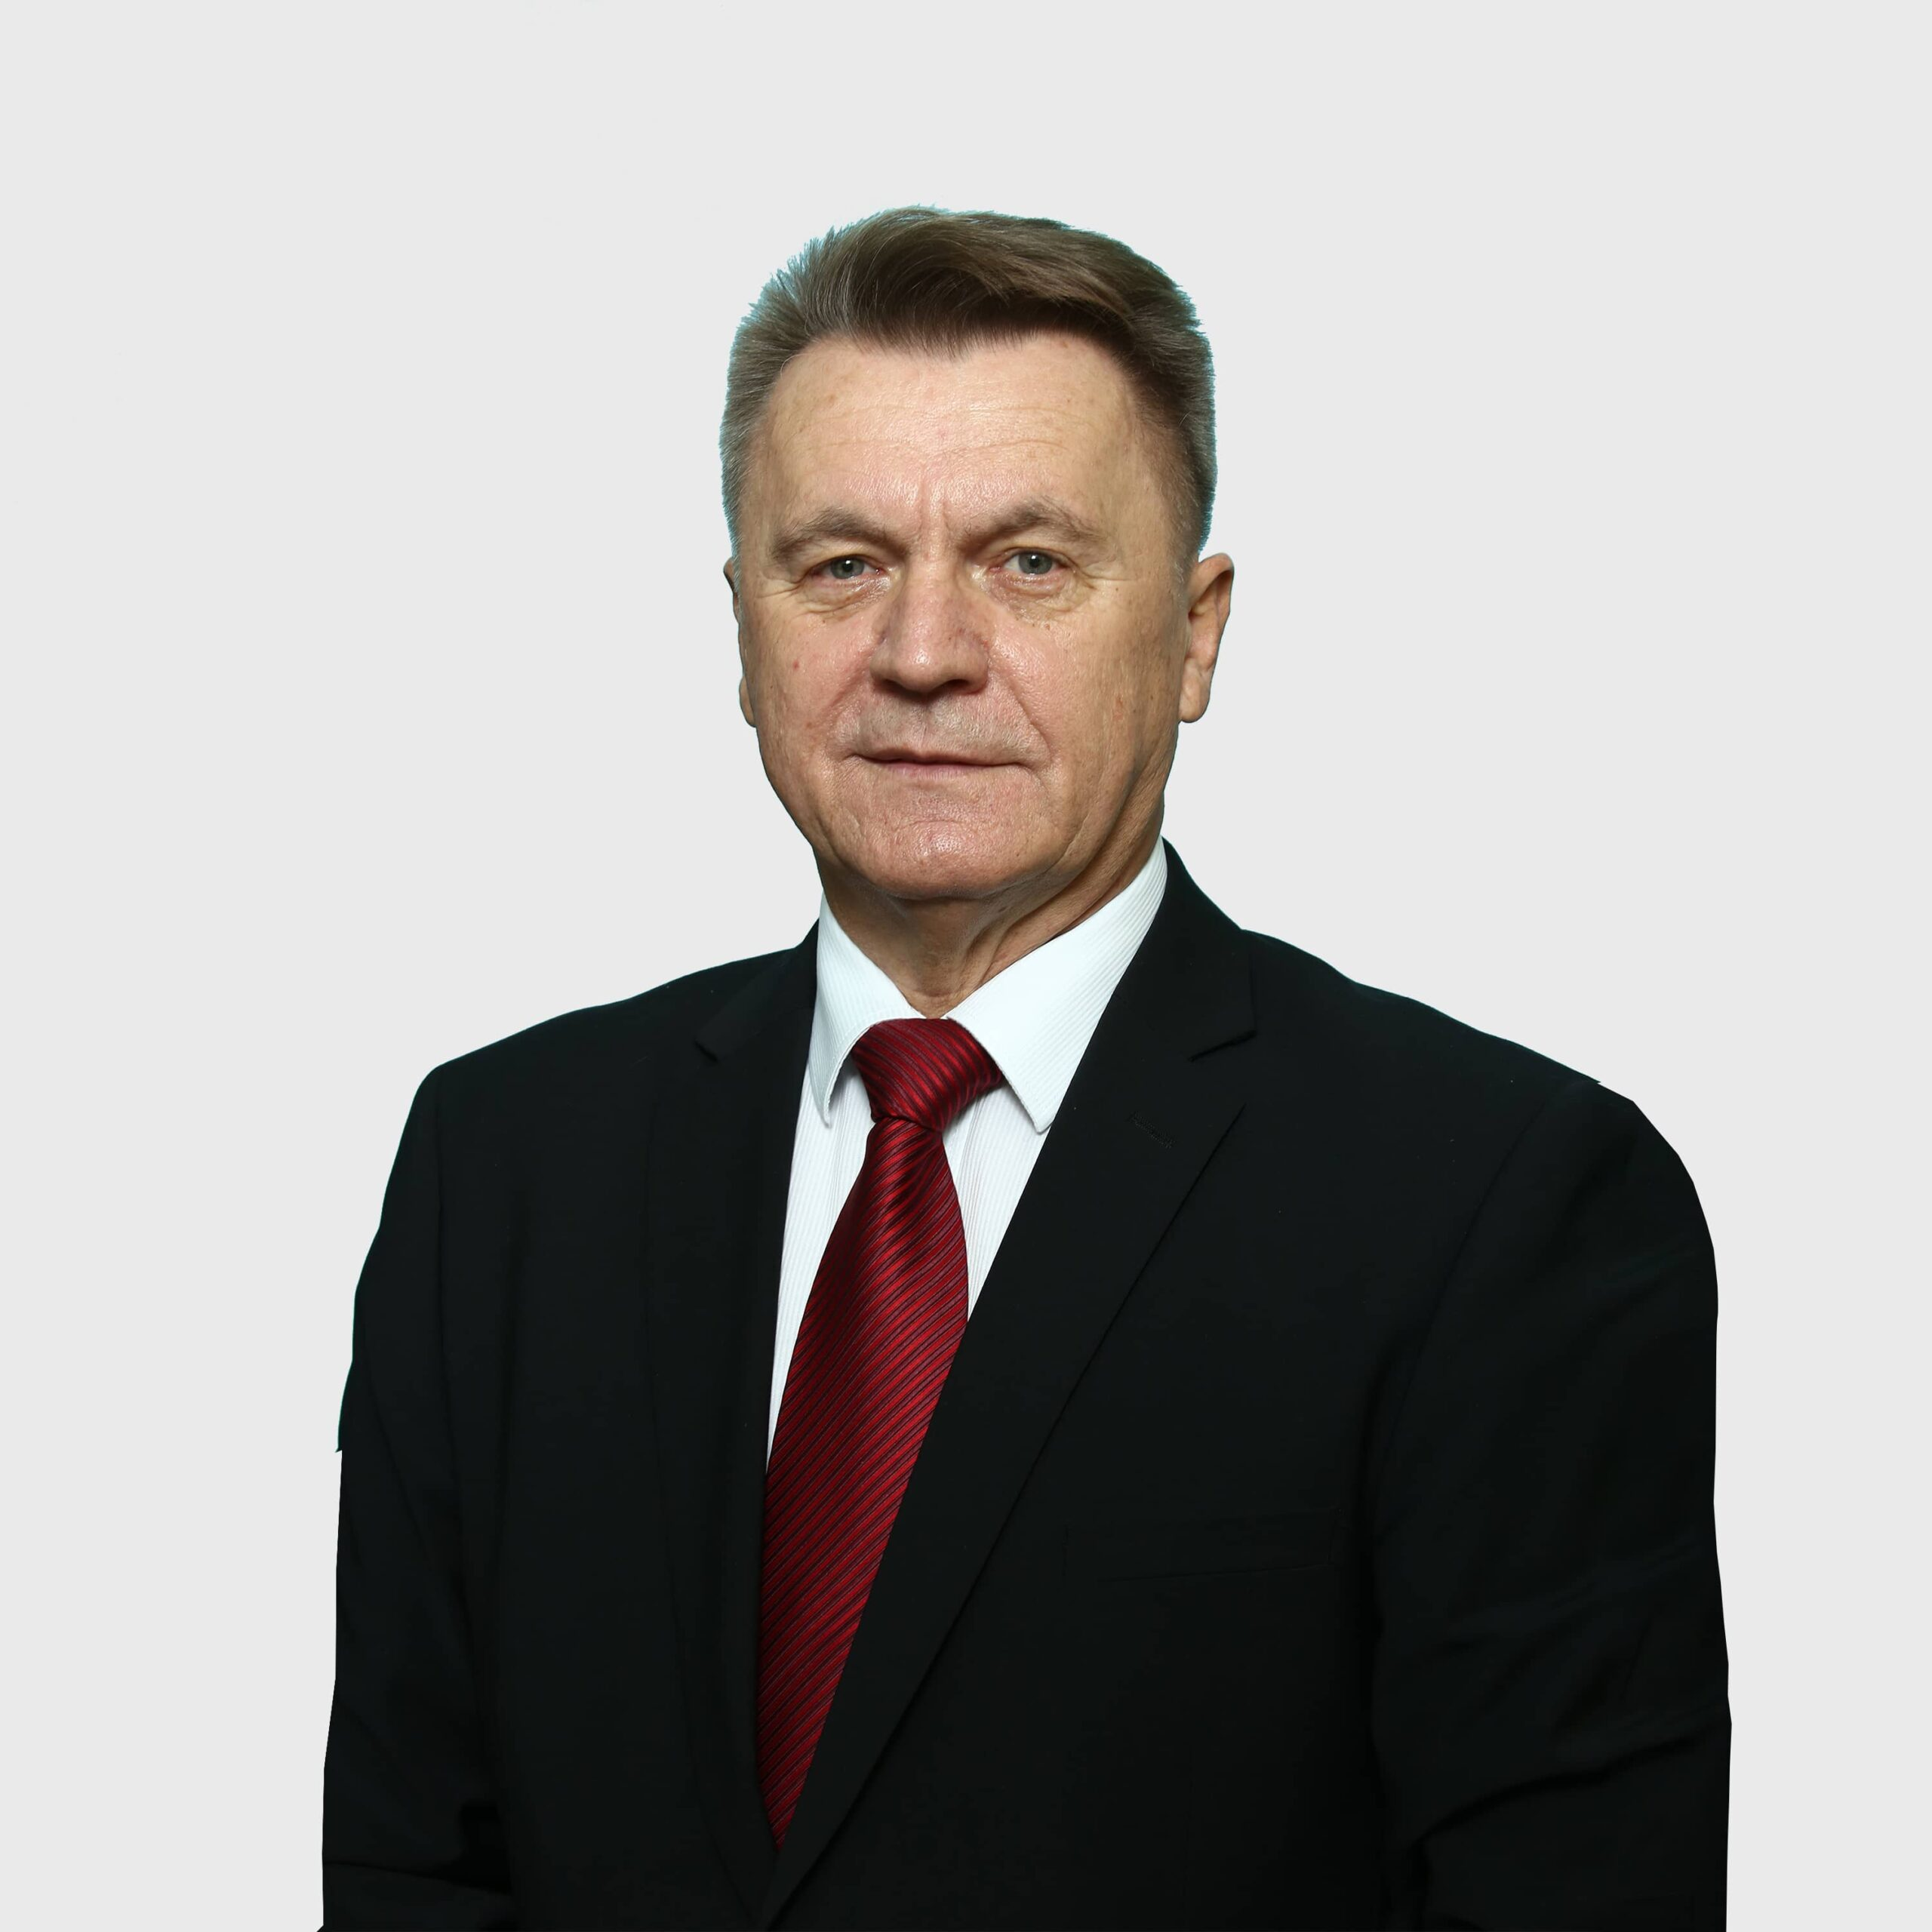 Sašo Murtič